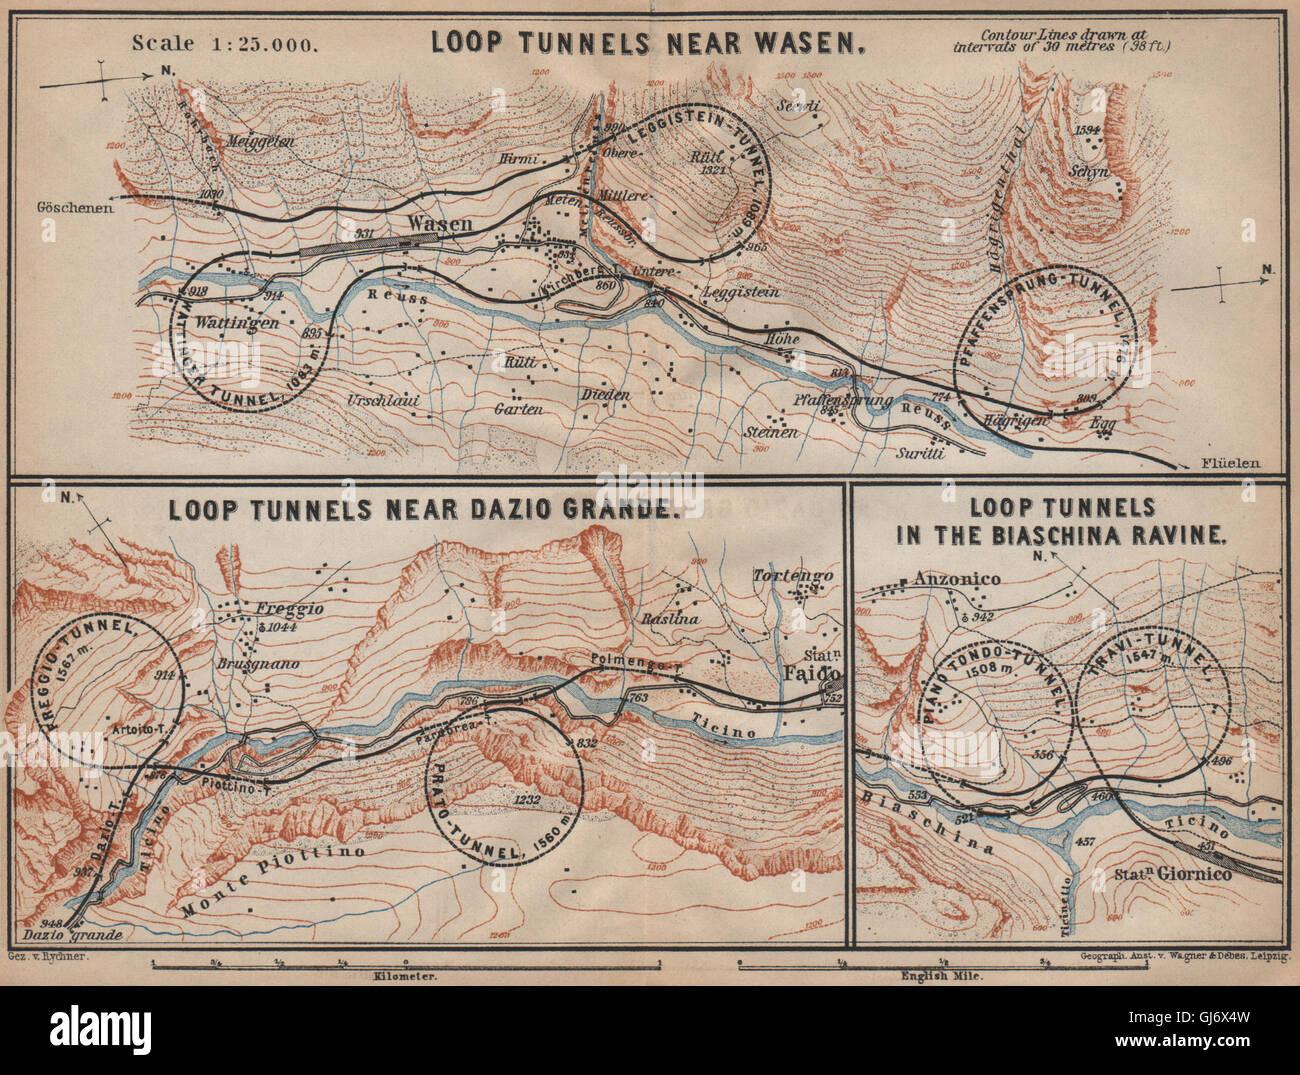 ST GOTTHARD RAILWAY SPIRAL/LOOP TUNNELS Wassen Freggio Prato Biaschina, 1907 map Stock Photo